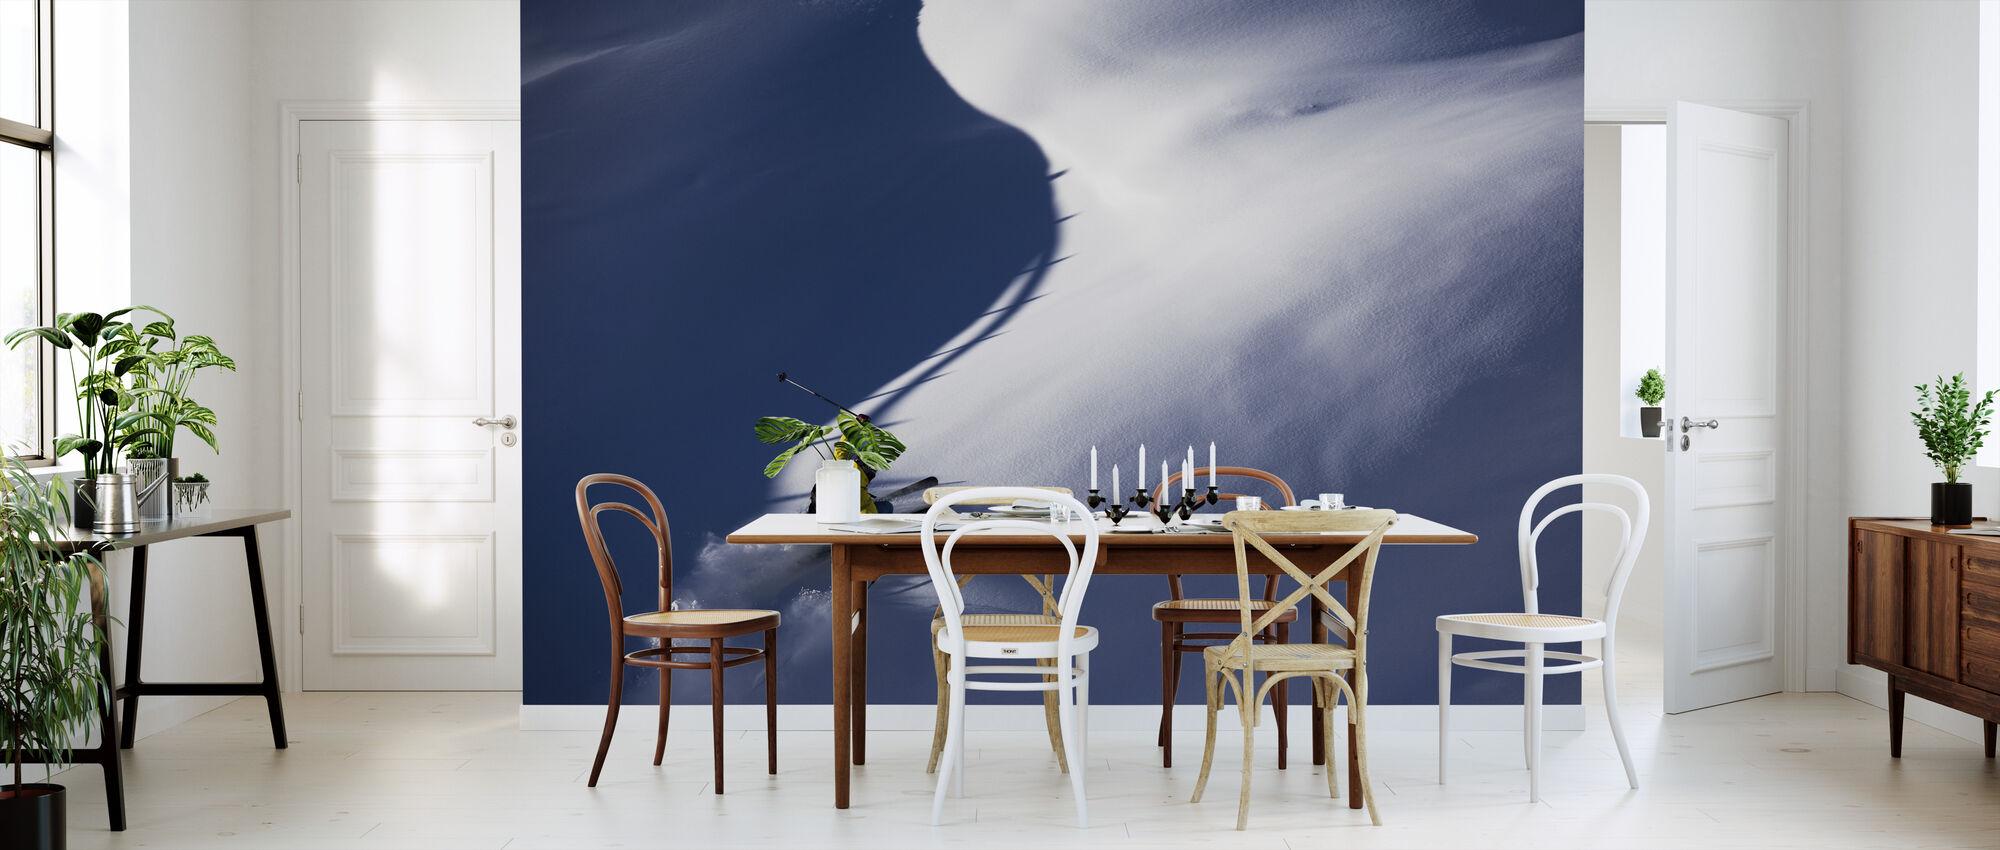 Powder Snow Skiing - Wallpaper - Kitchen